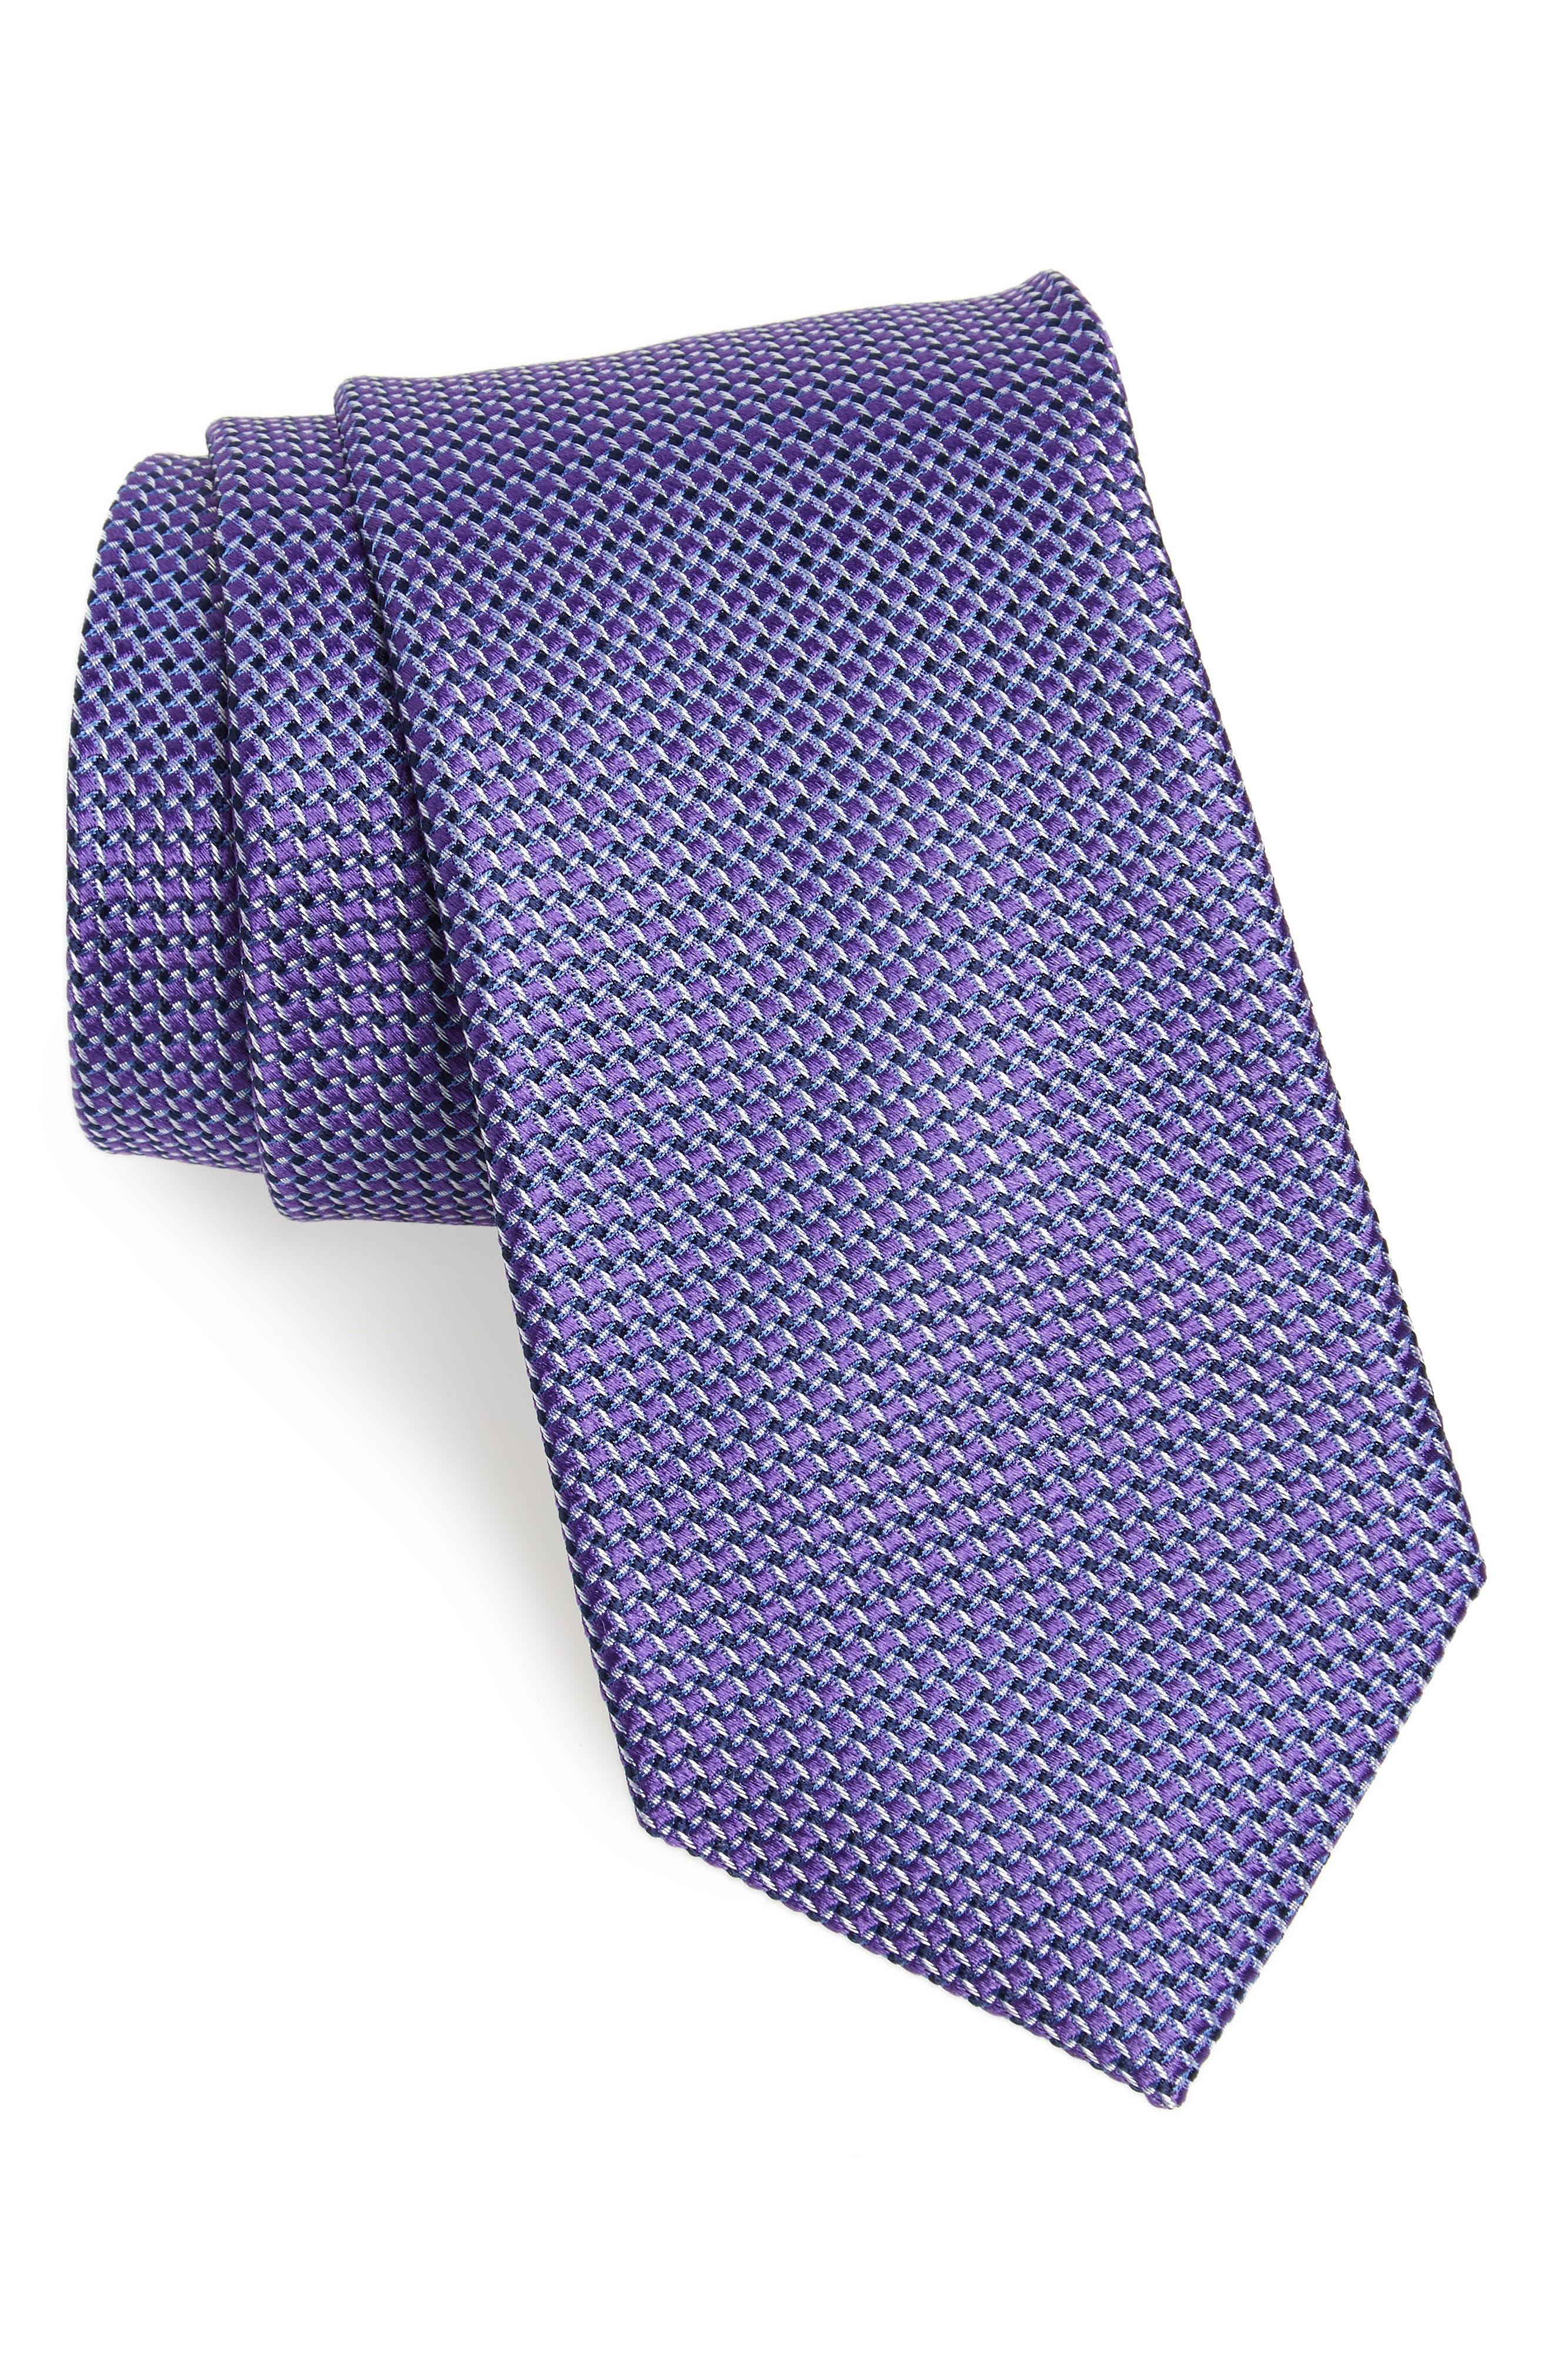 Russo Geo Print Silk Tie,                         Main,                         color, Purple